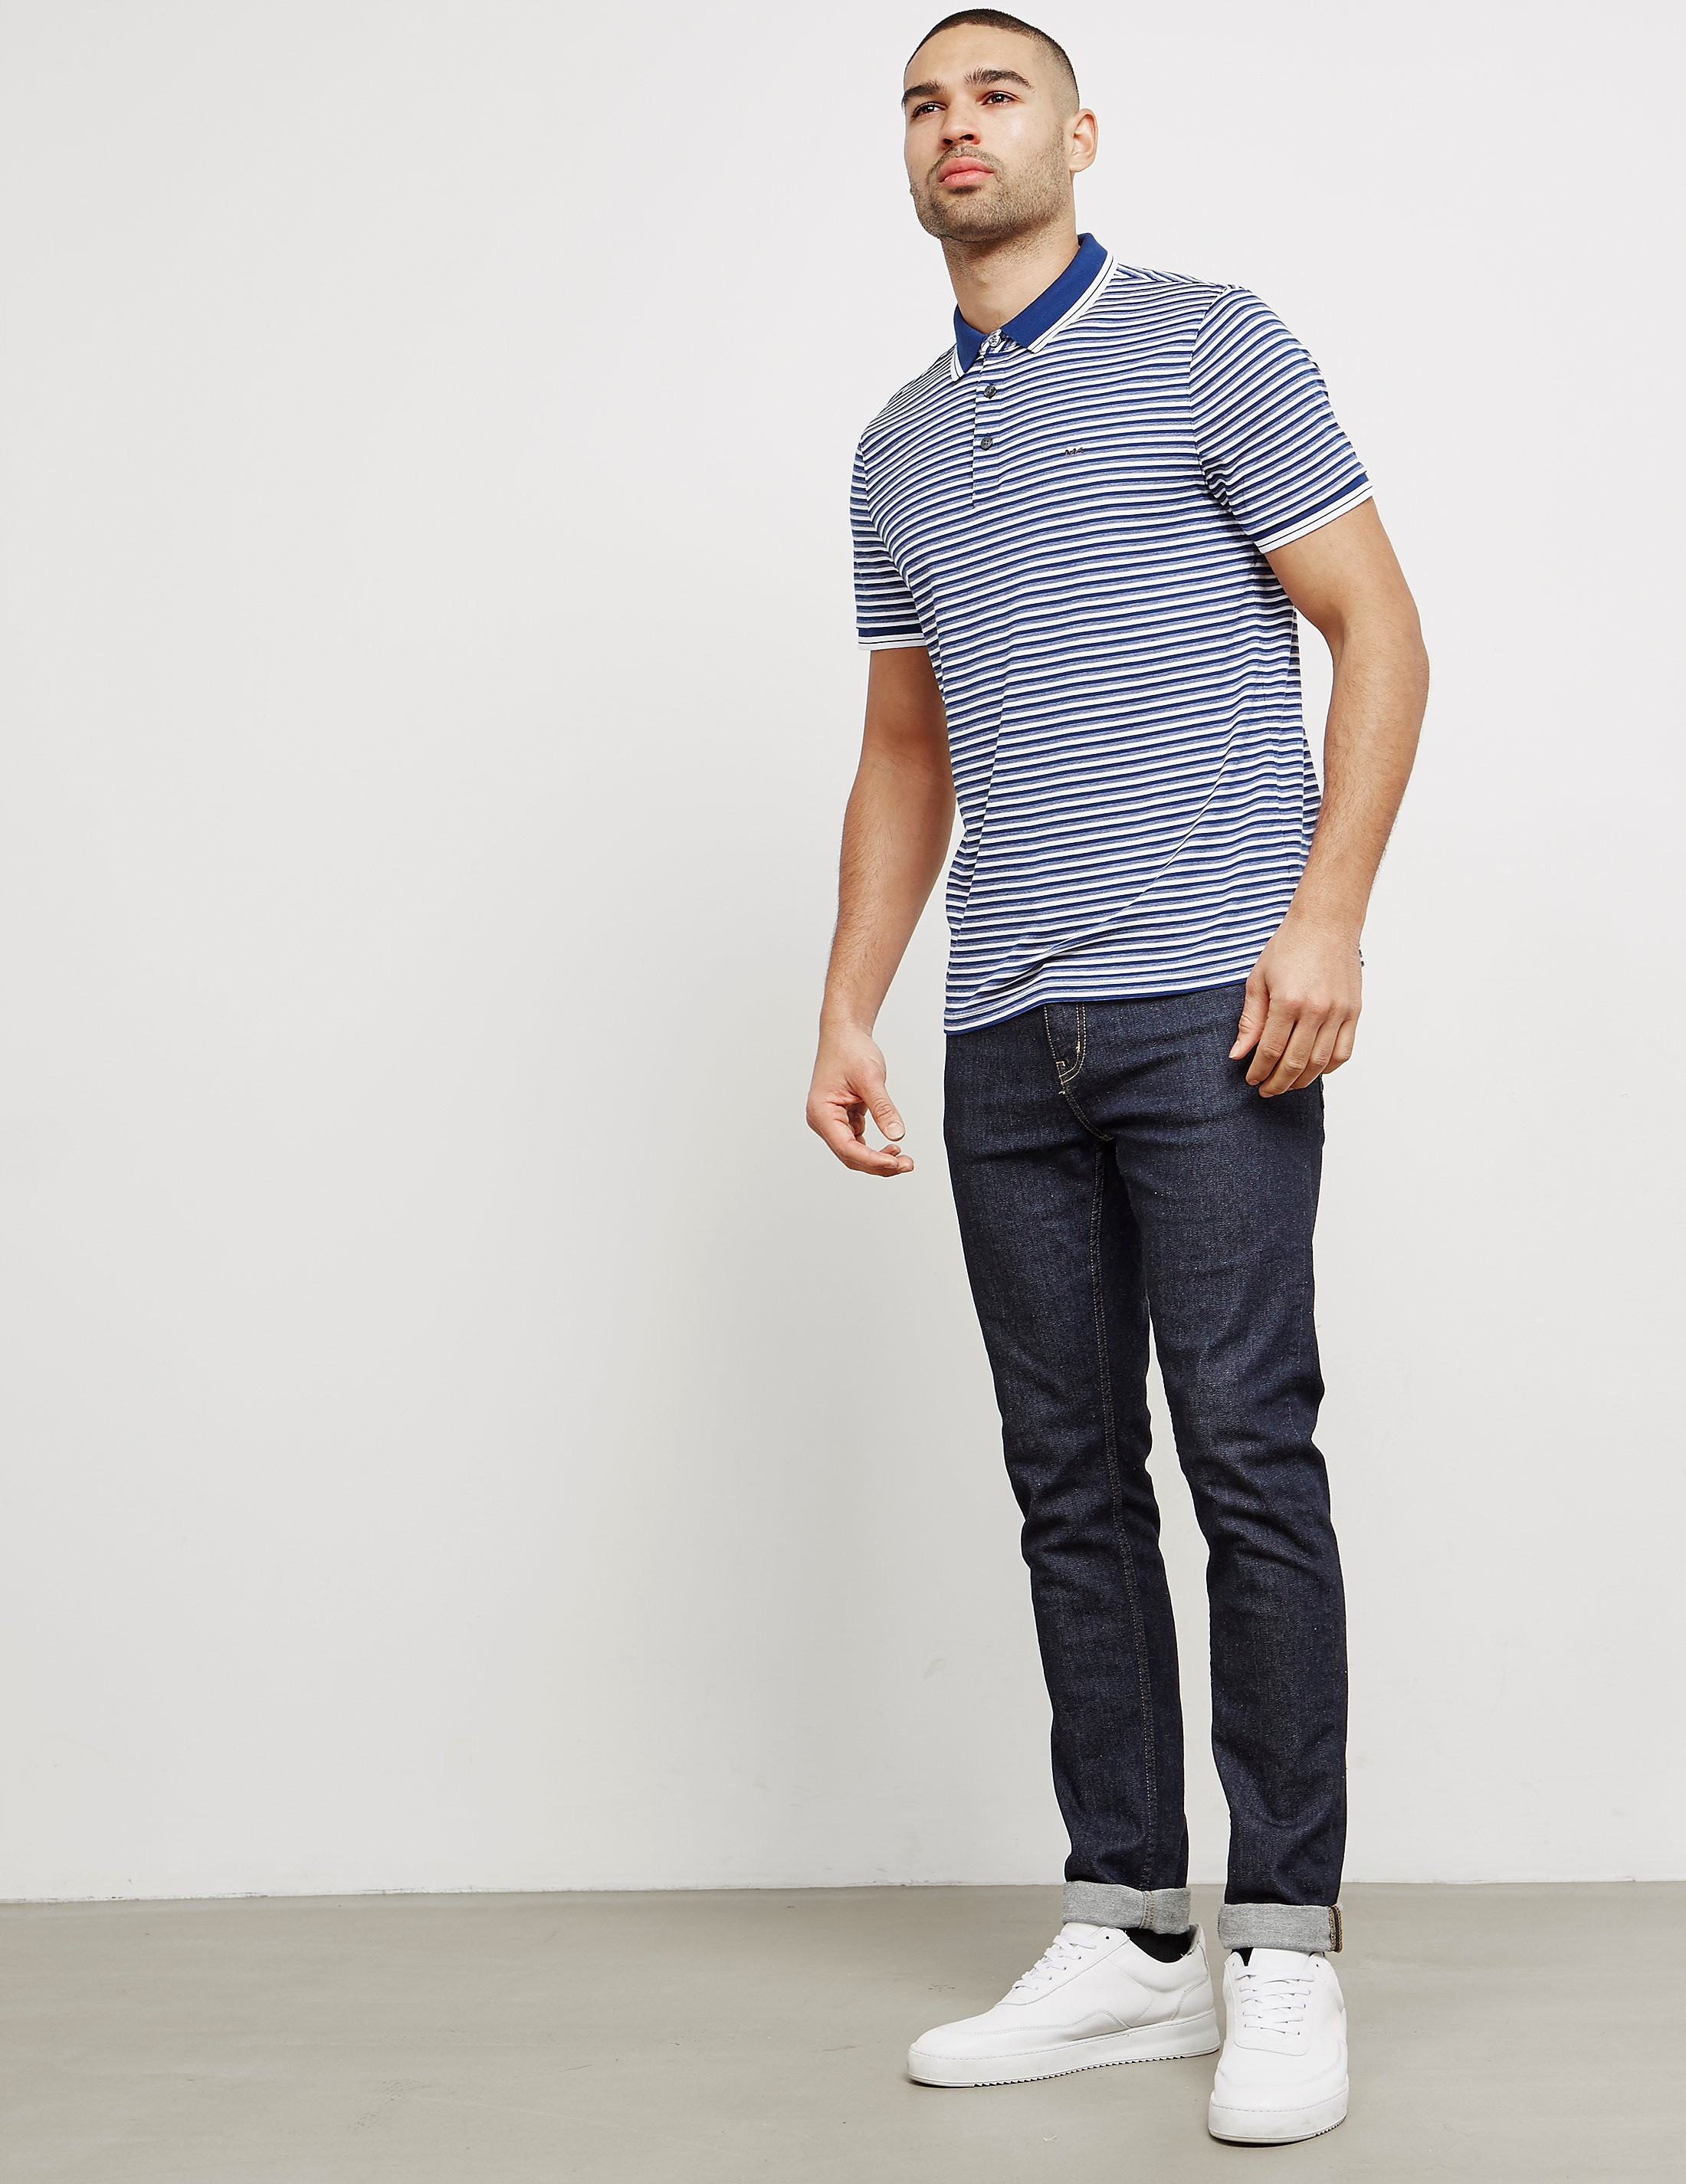 Michael Kors Stripe Short Sleeve Polo Shirt